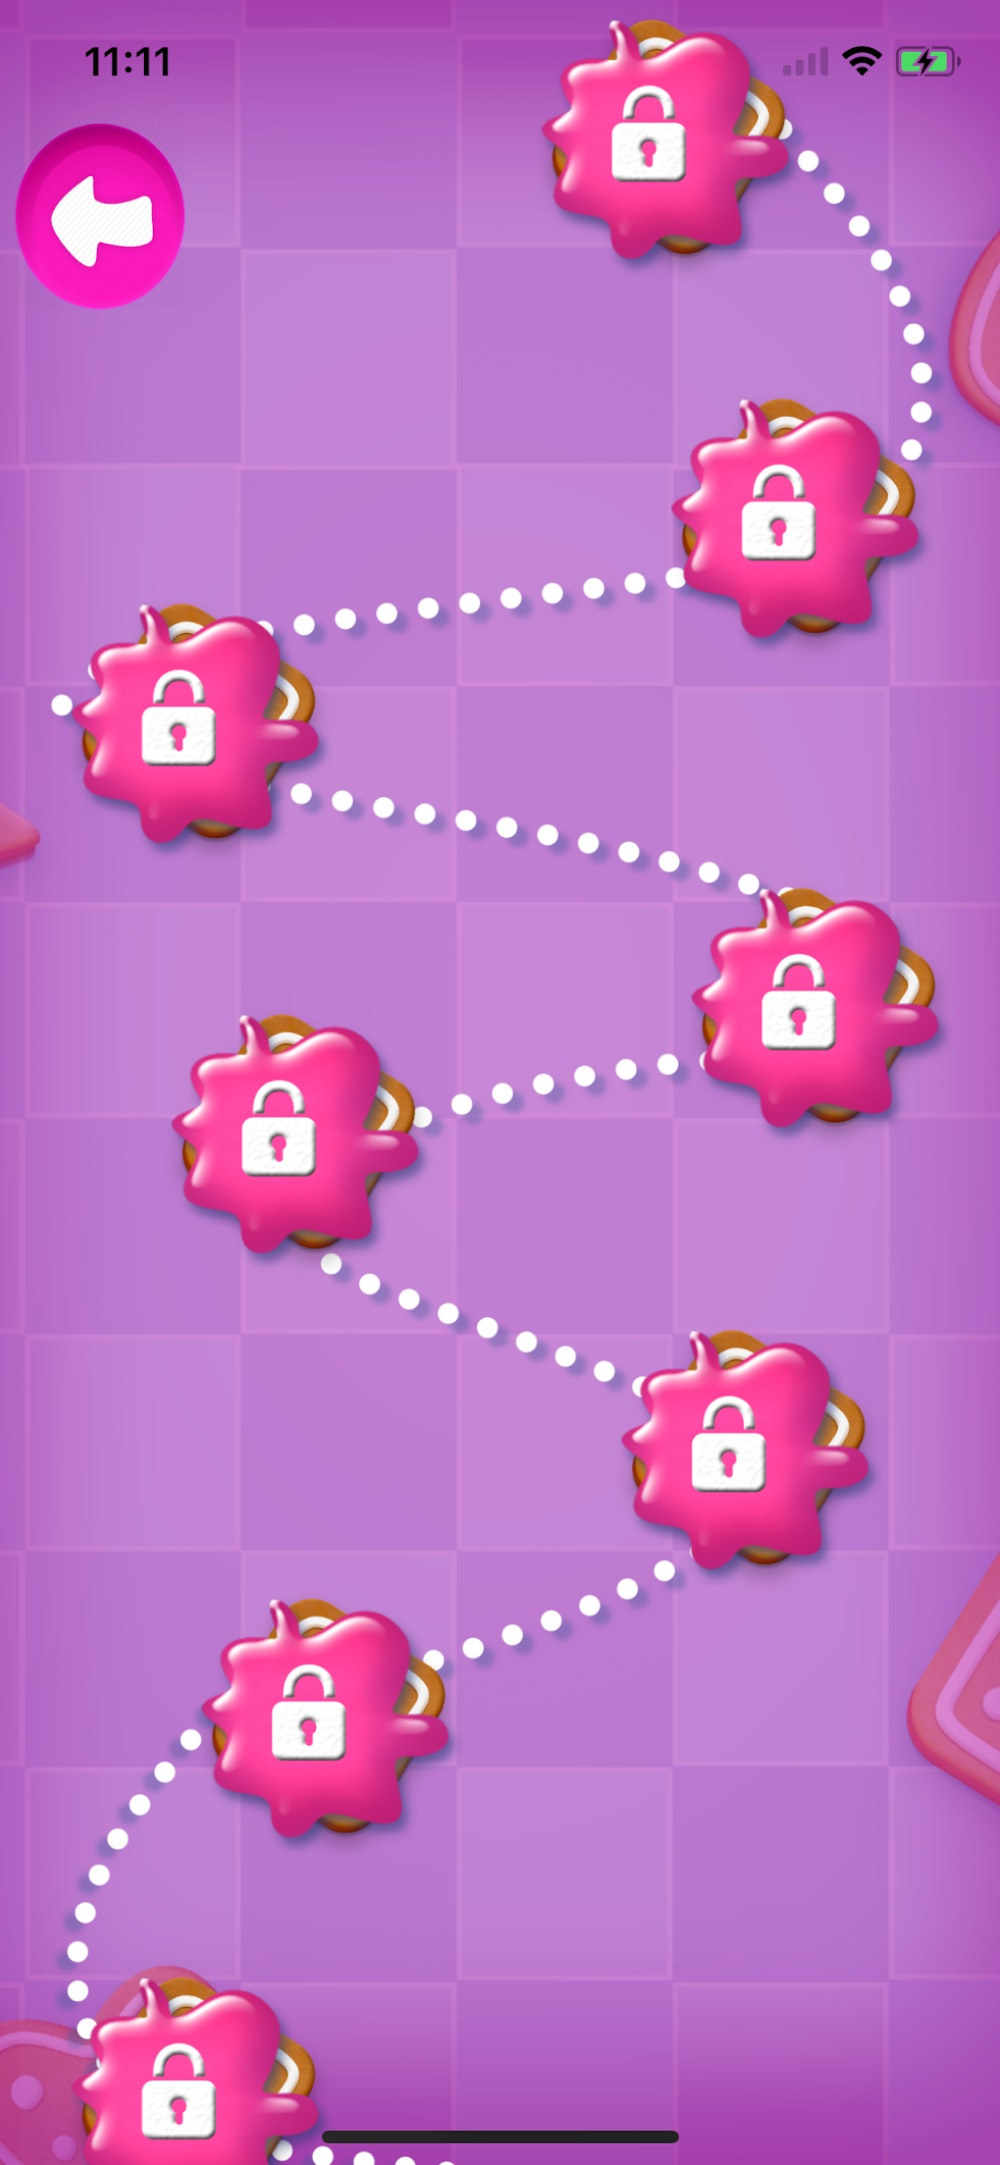 Gumball Smash hack tool